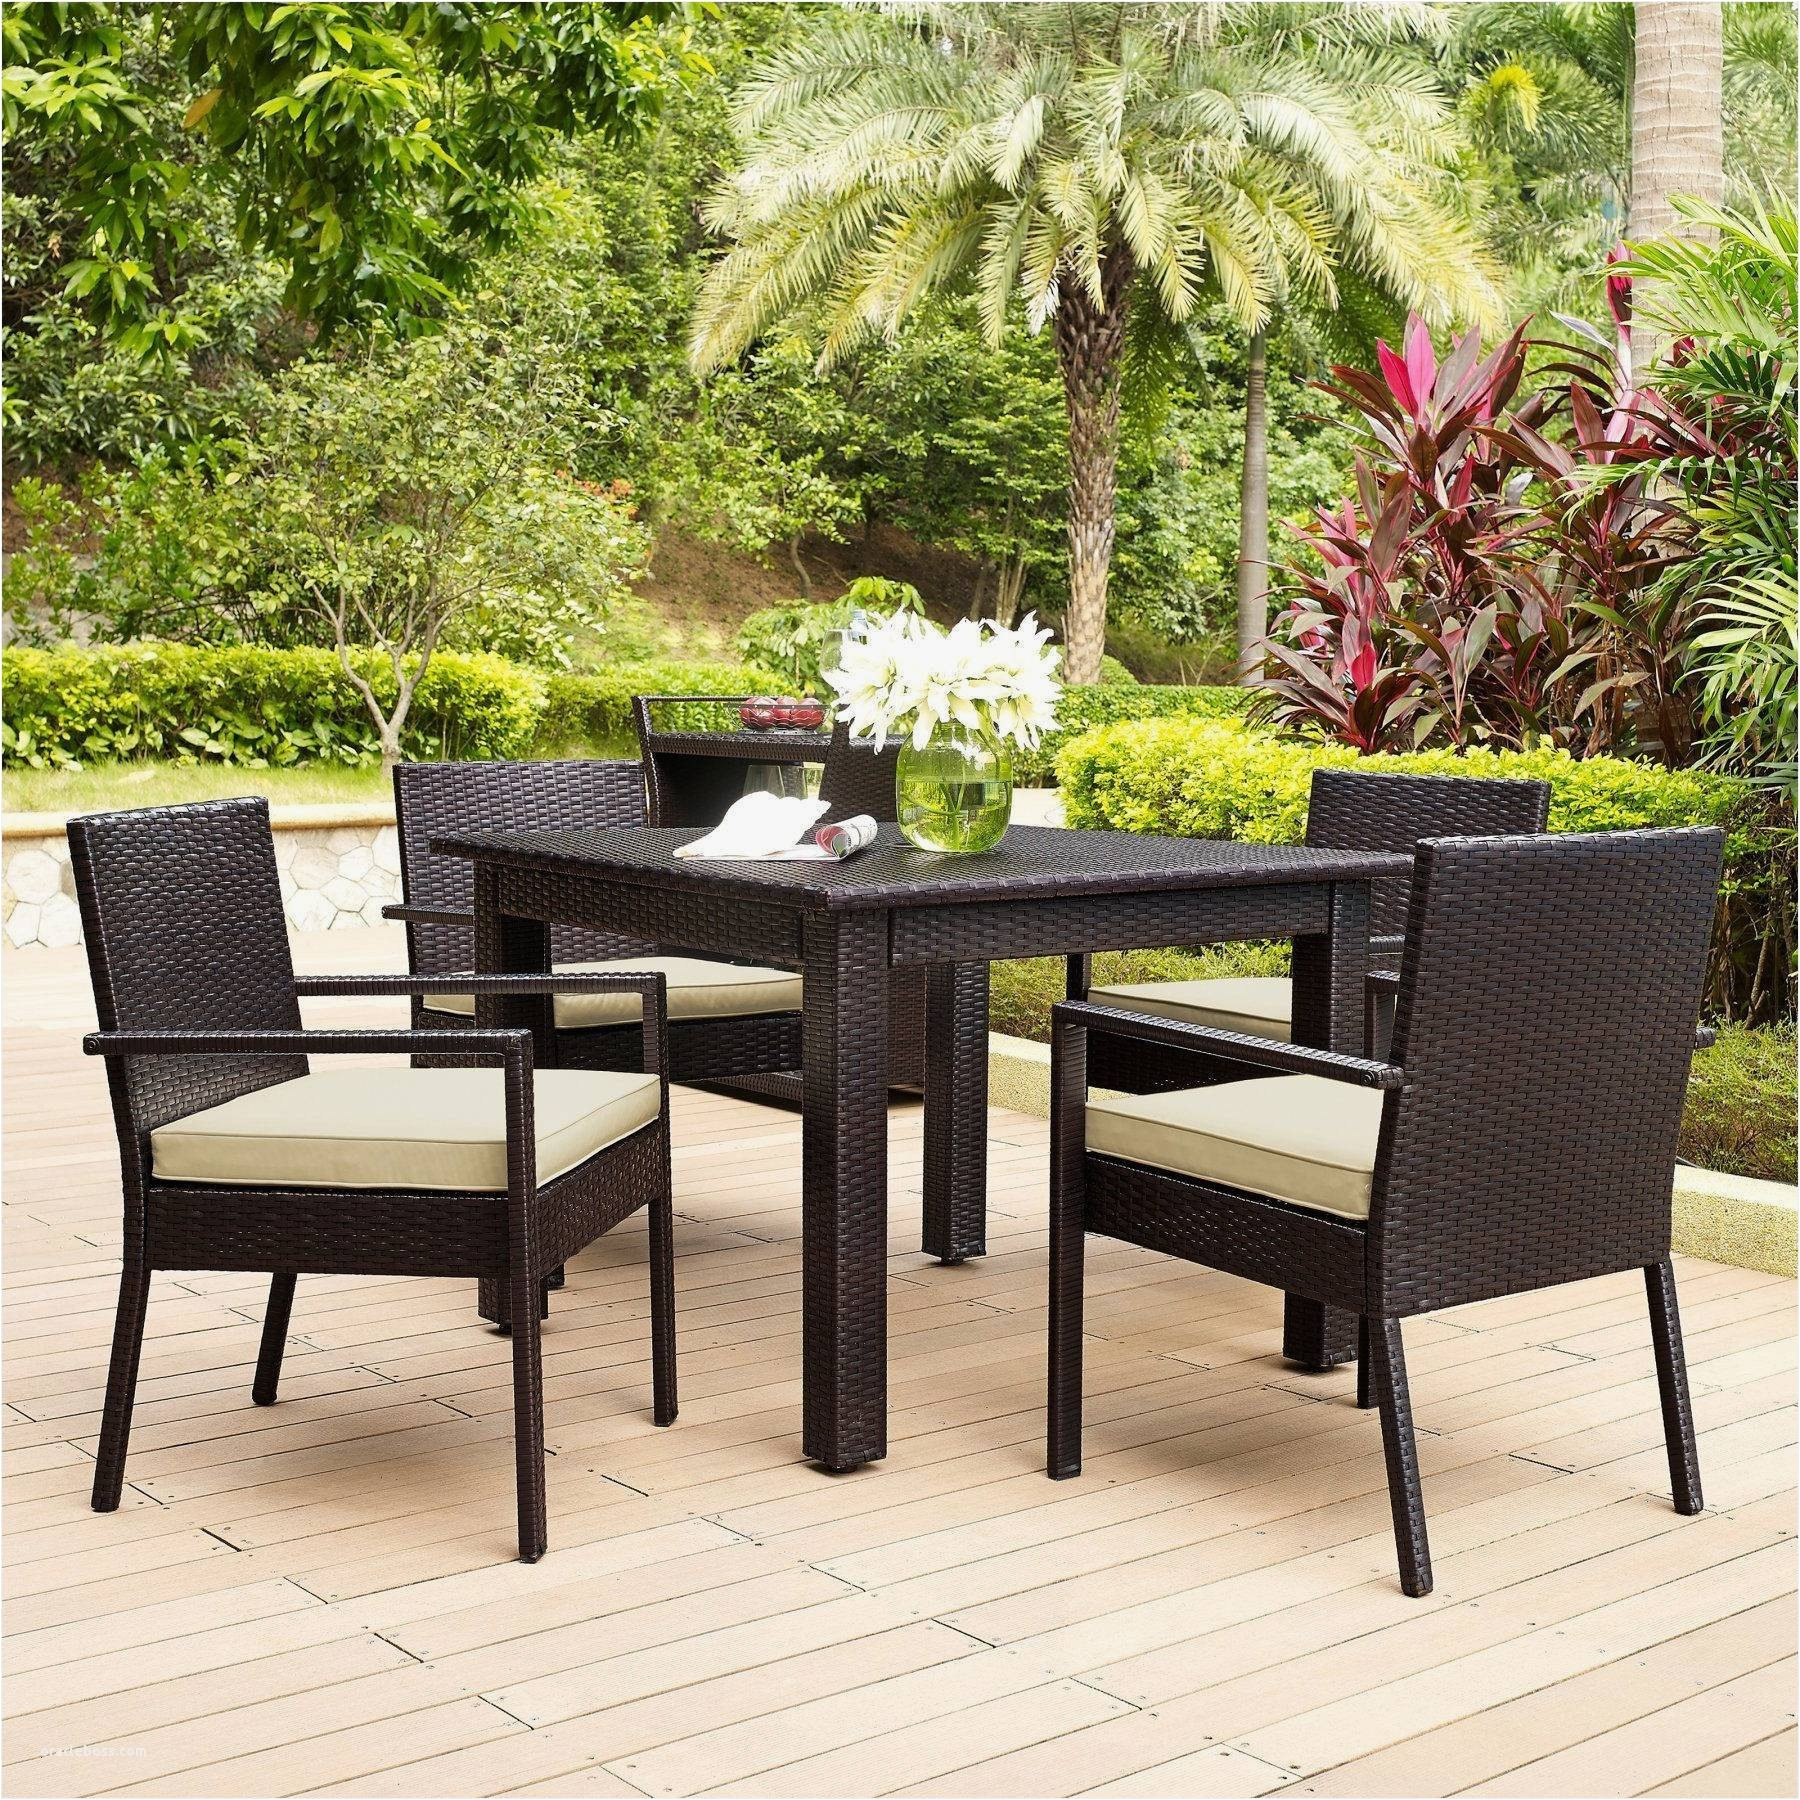 end of season patio furniture sale unique outdoor furniture fabric inspirational wicker outdoor sofa 0d patio